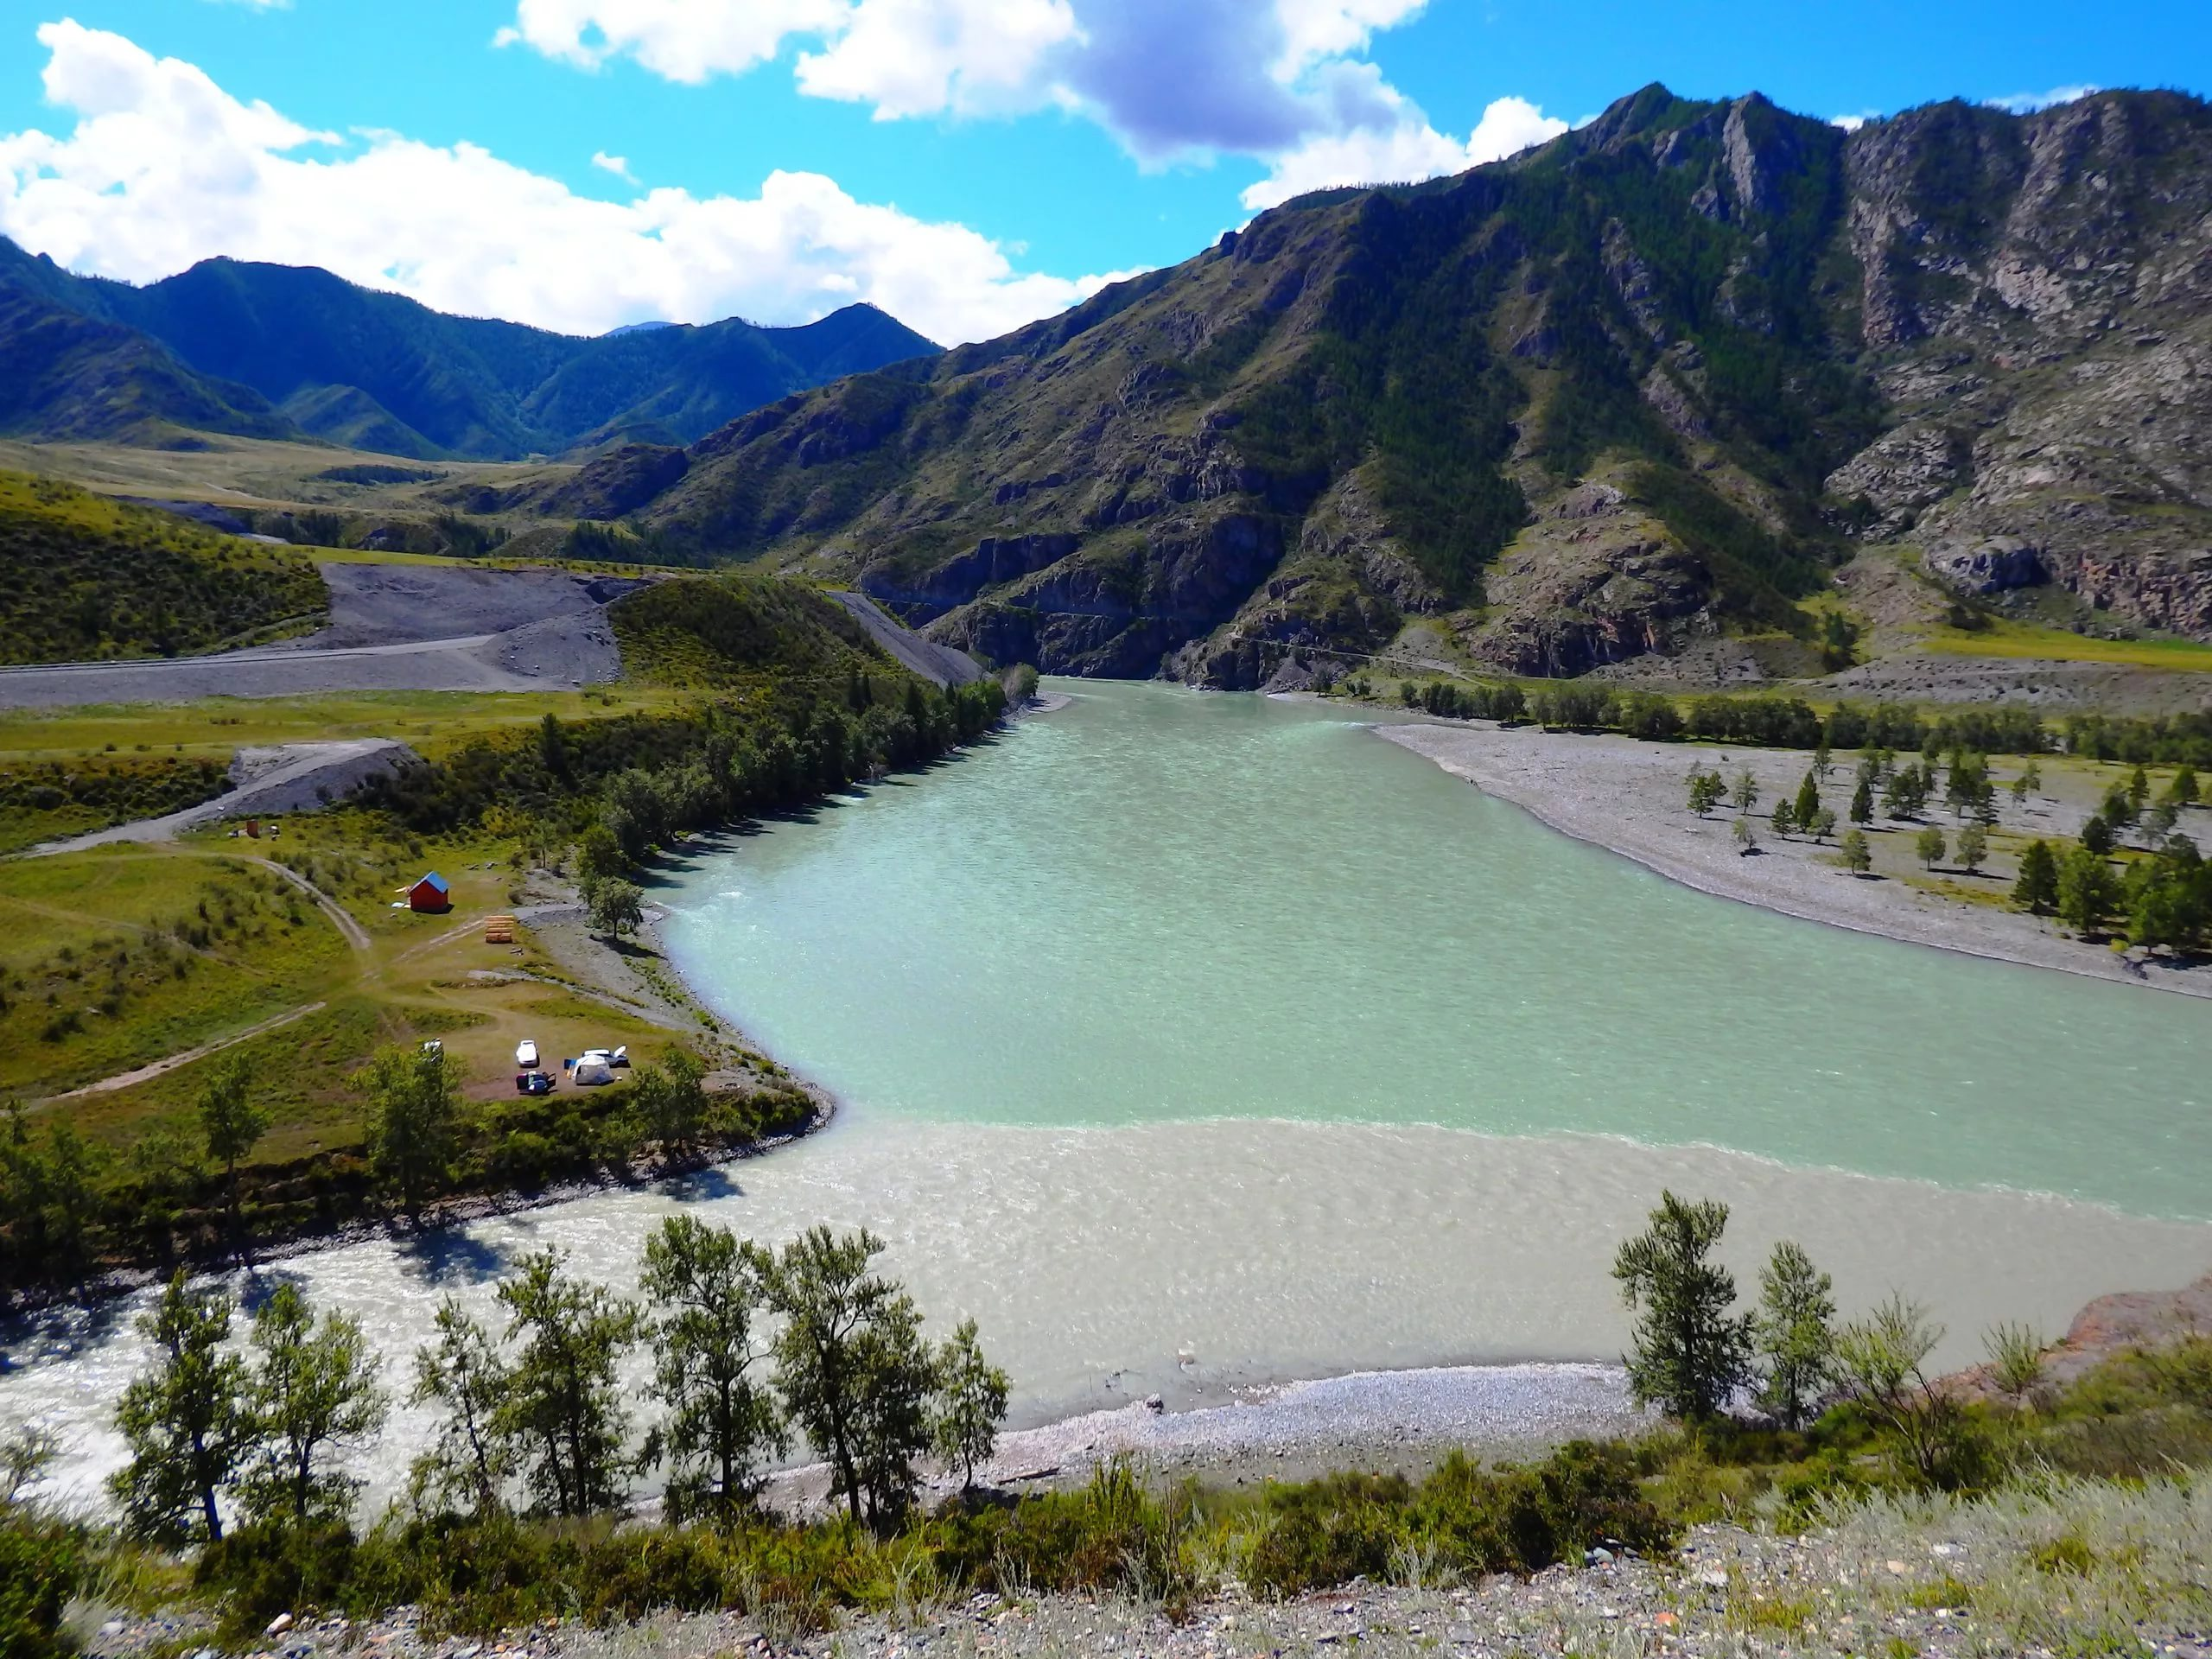 15 1 - 10 locais no Altay que vale a pena visitar